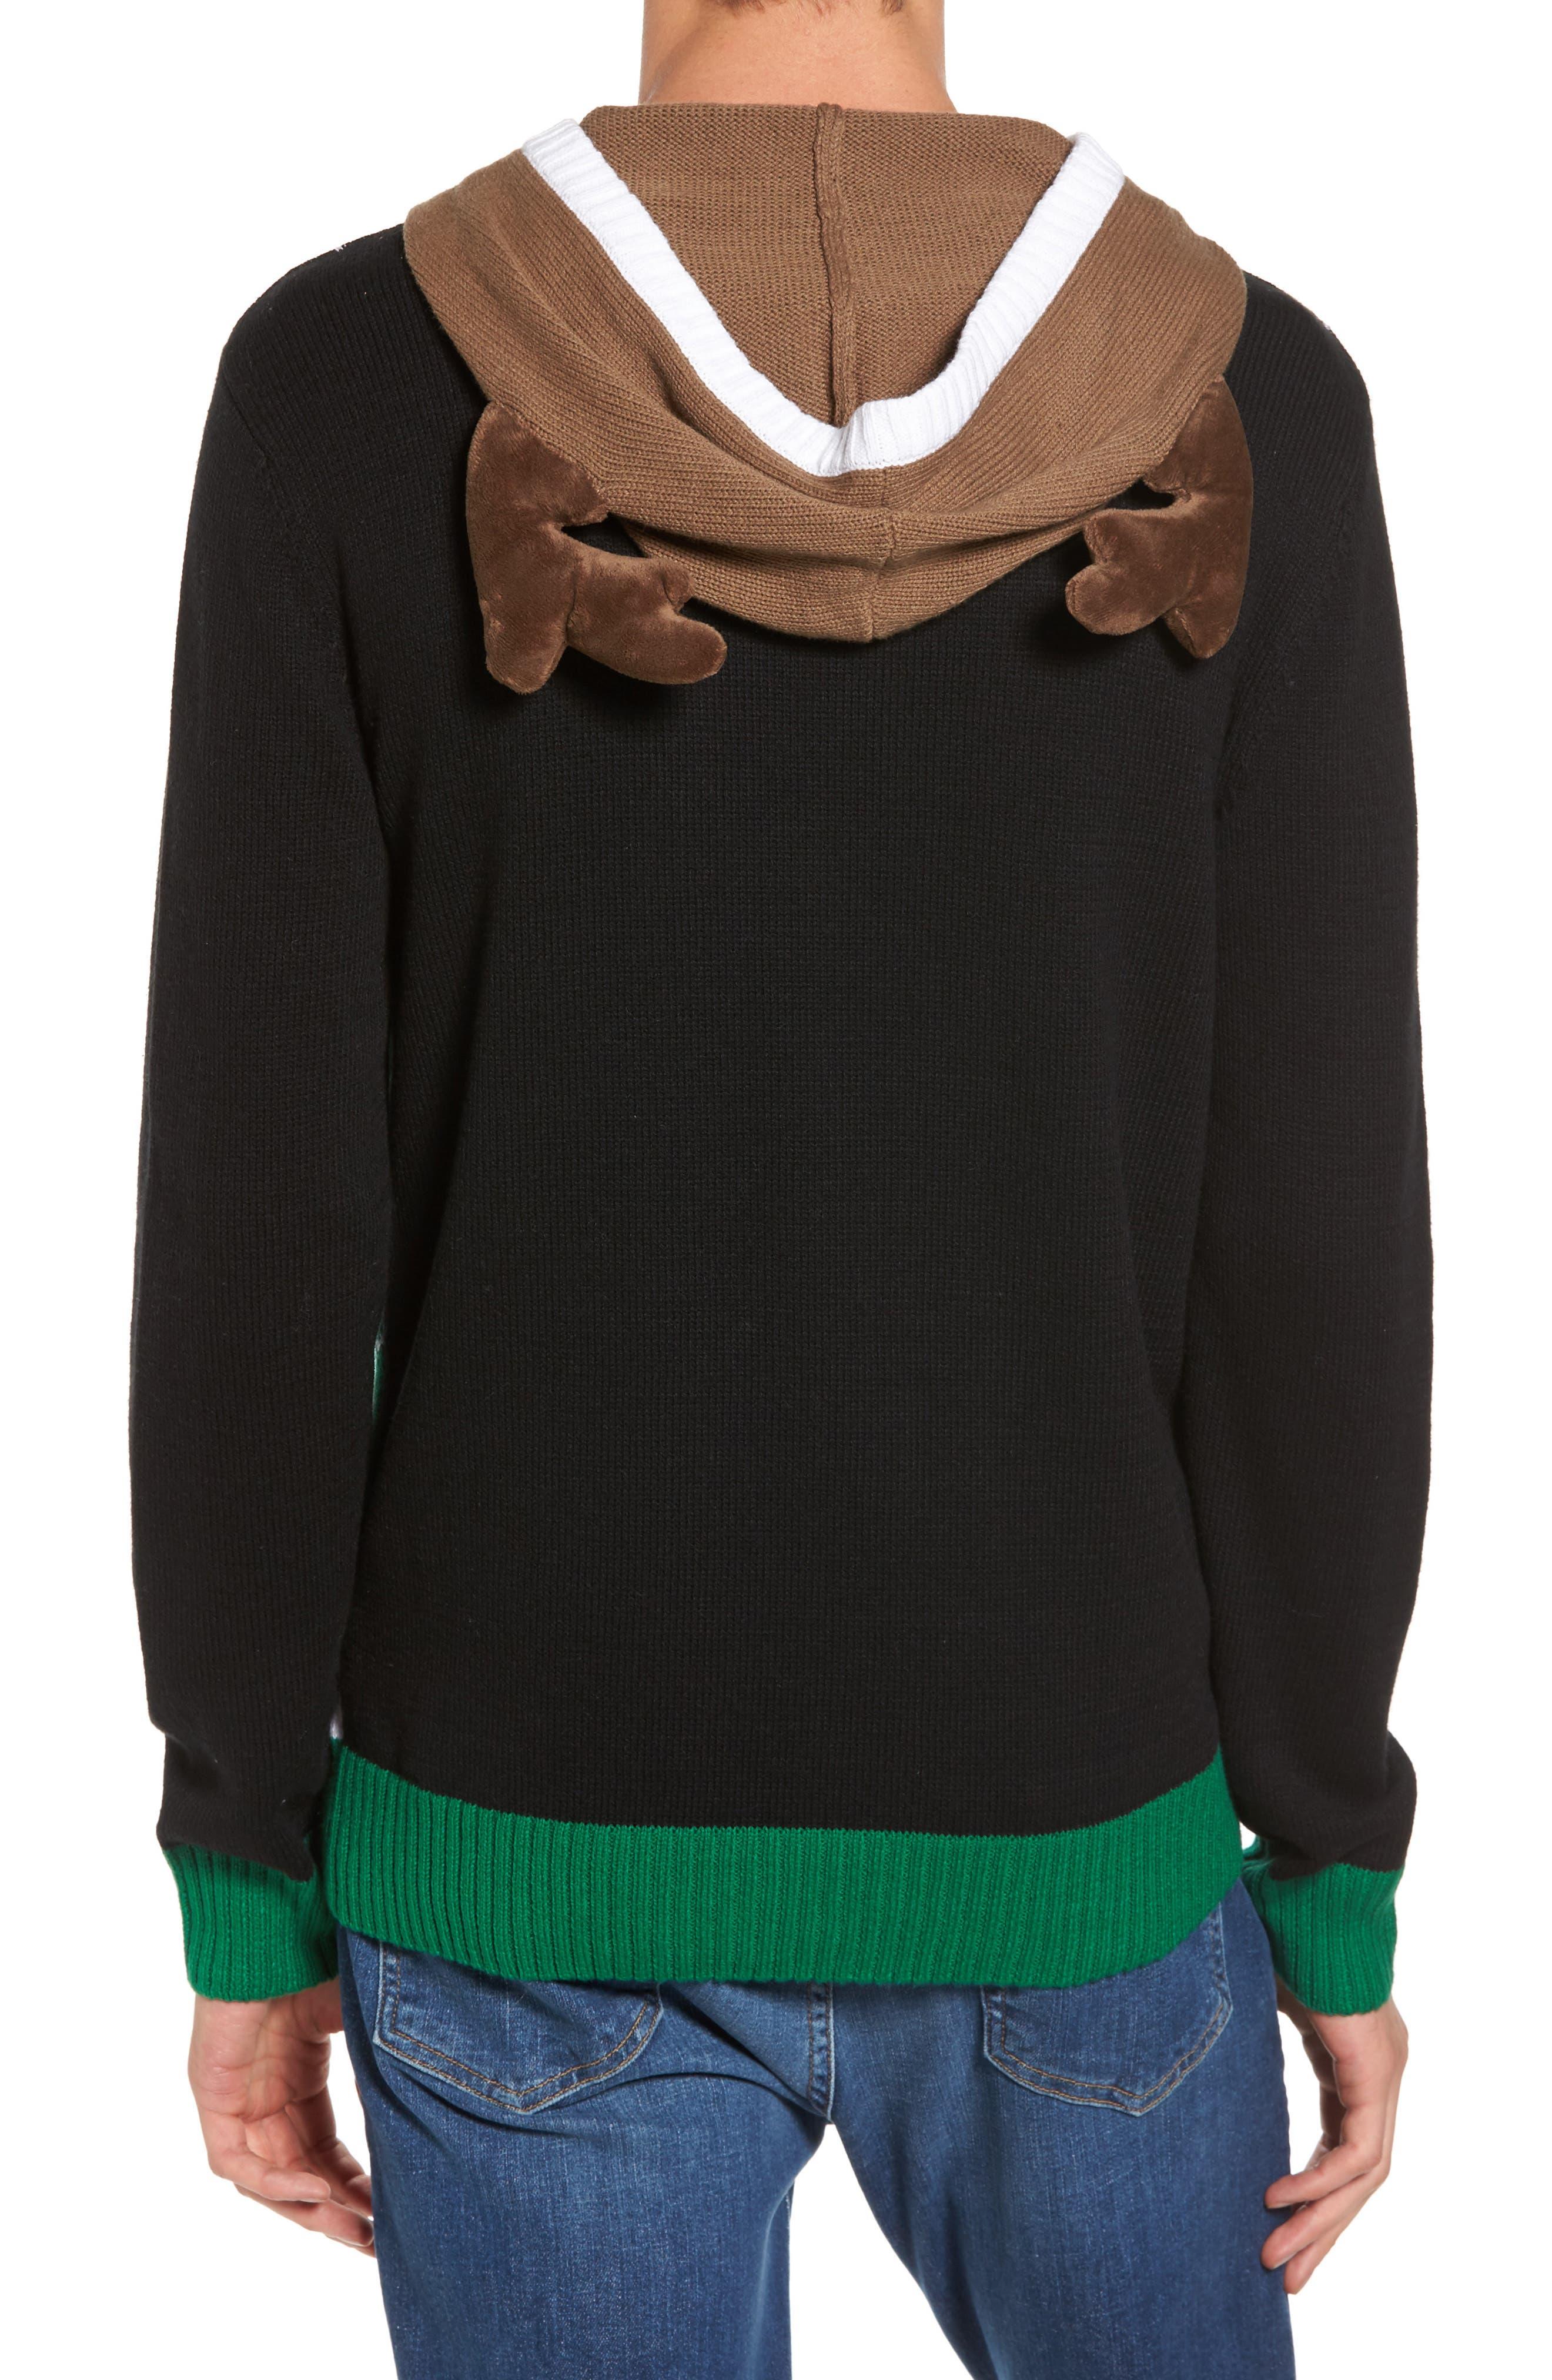 Reindeer Hooded Sweater,                             Alternate thumbnail 2, color,                             001